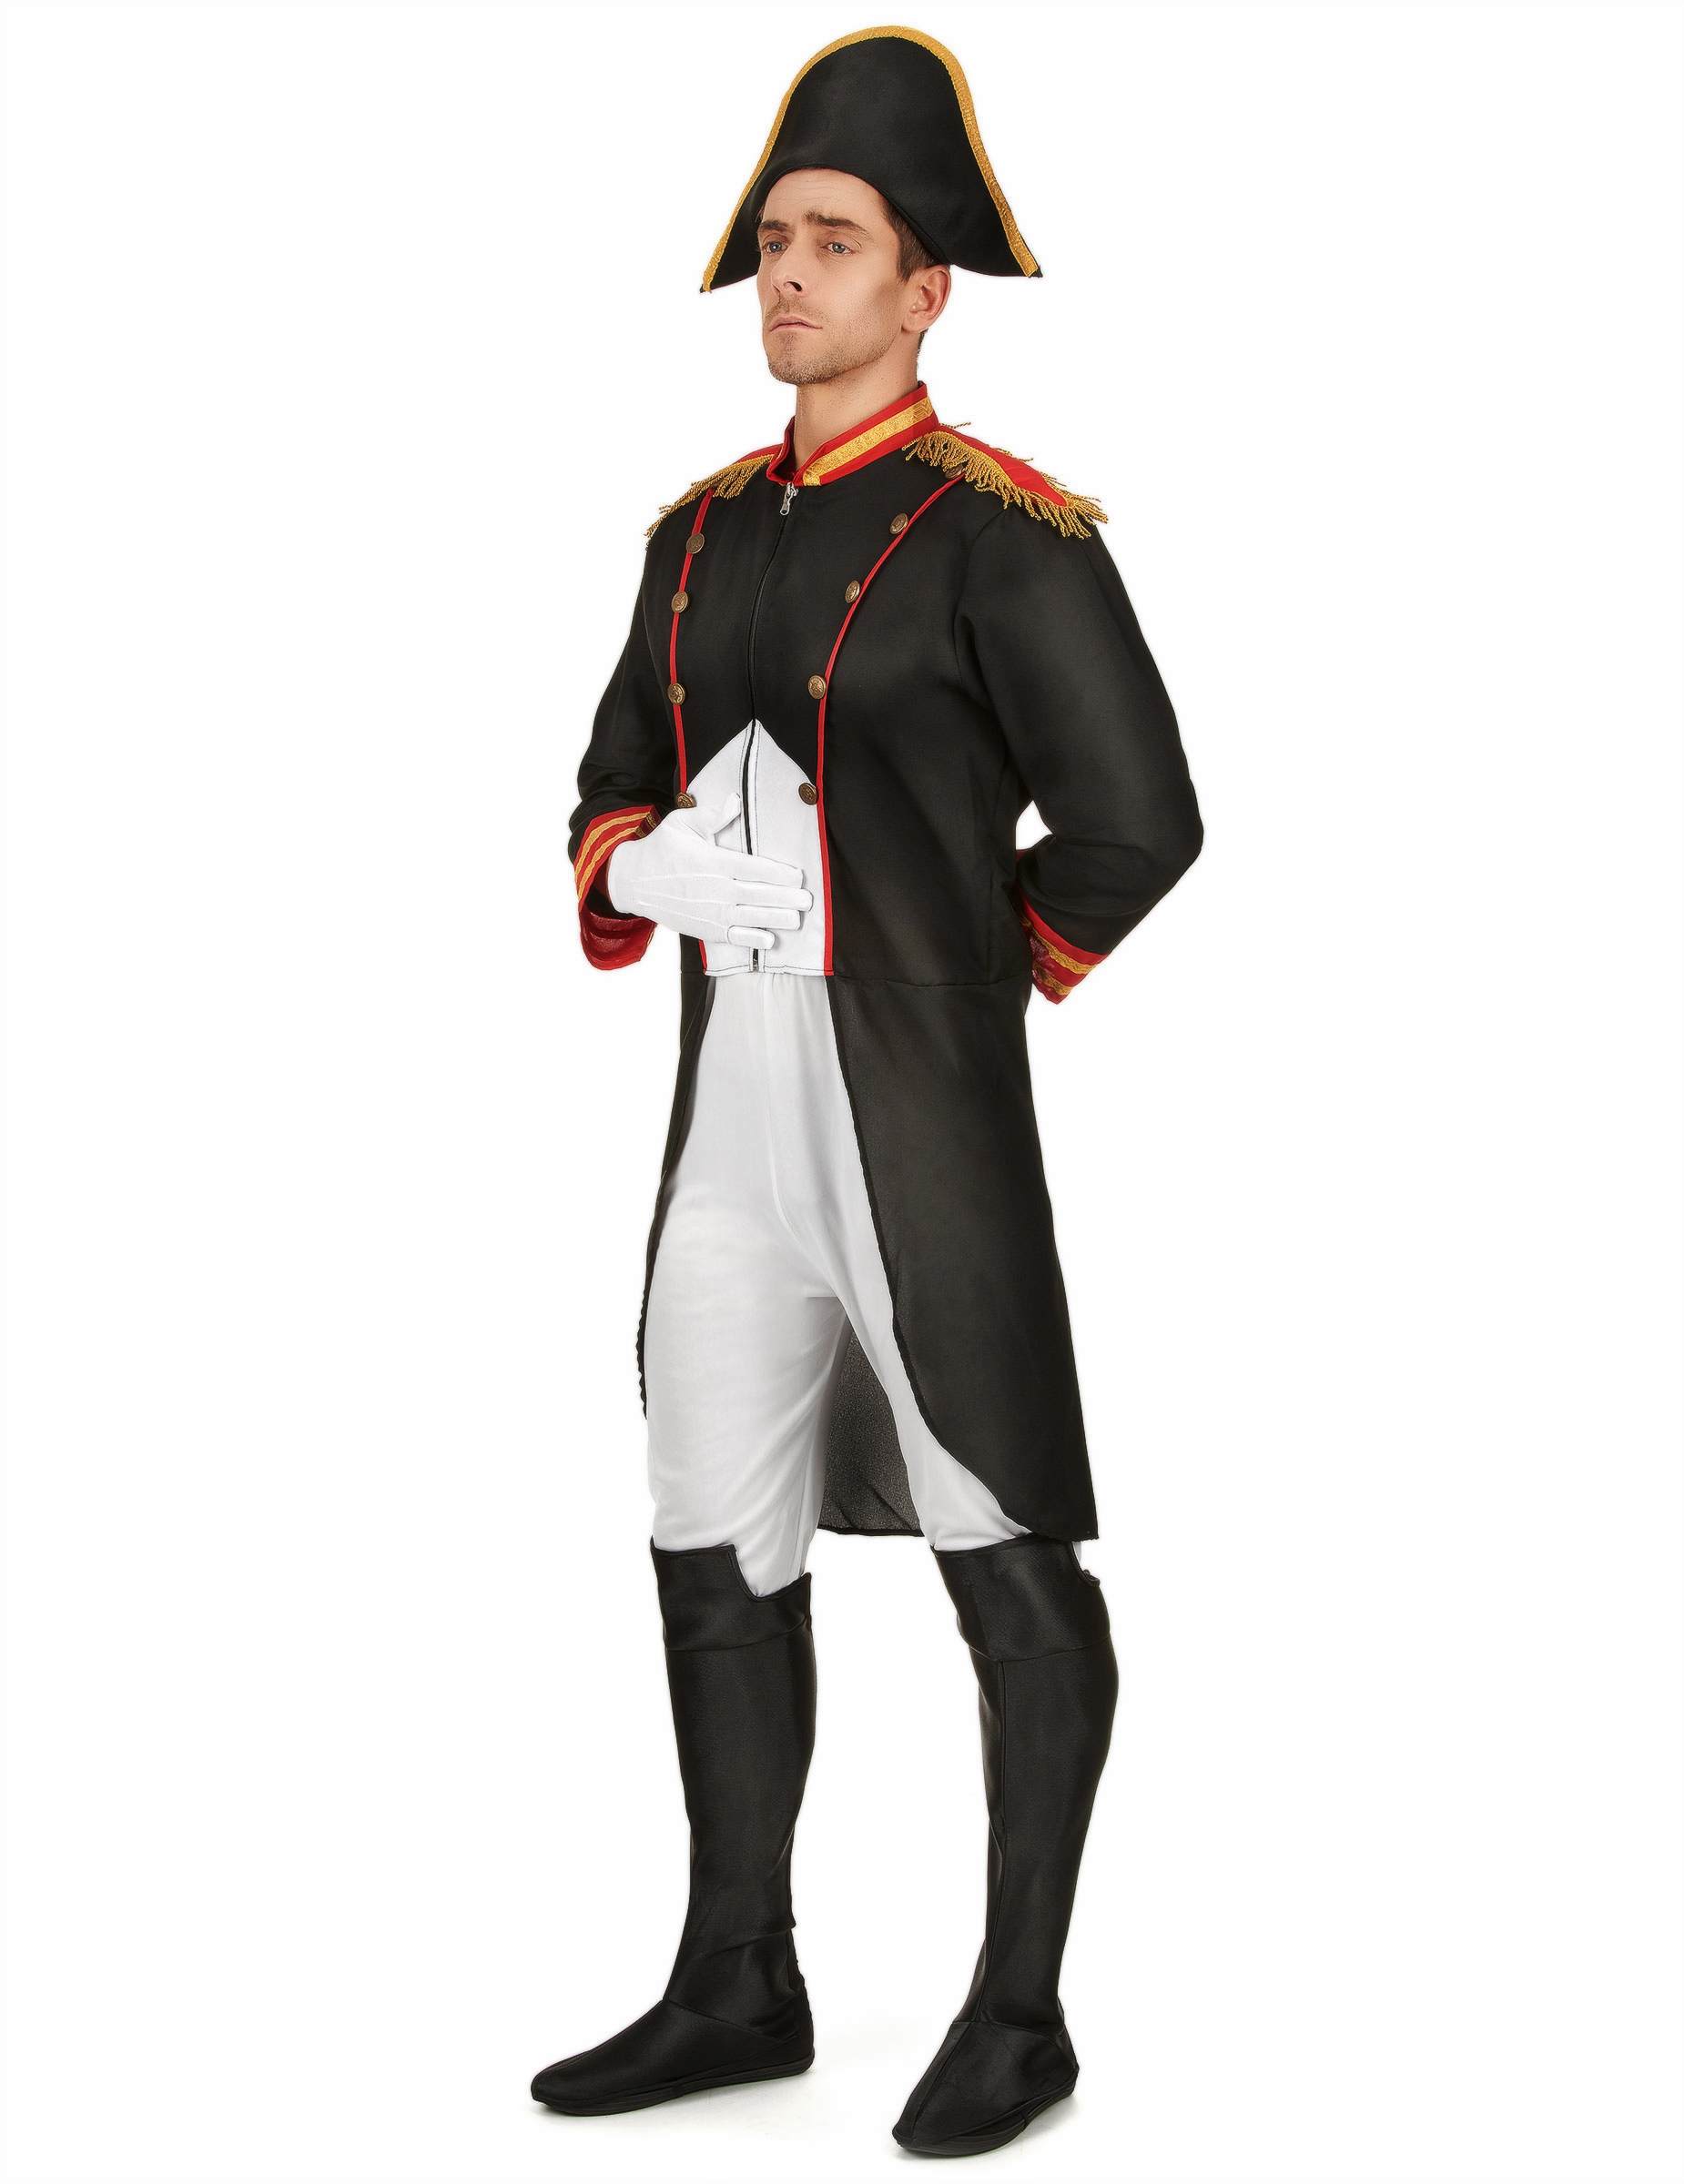 eca77433b2428 Costumi da personaggi storici per adulti - Vegaoo.it